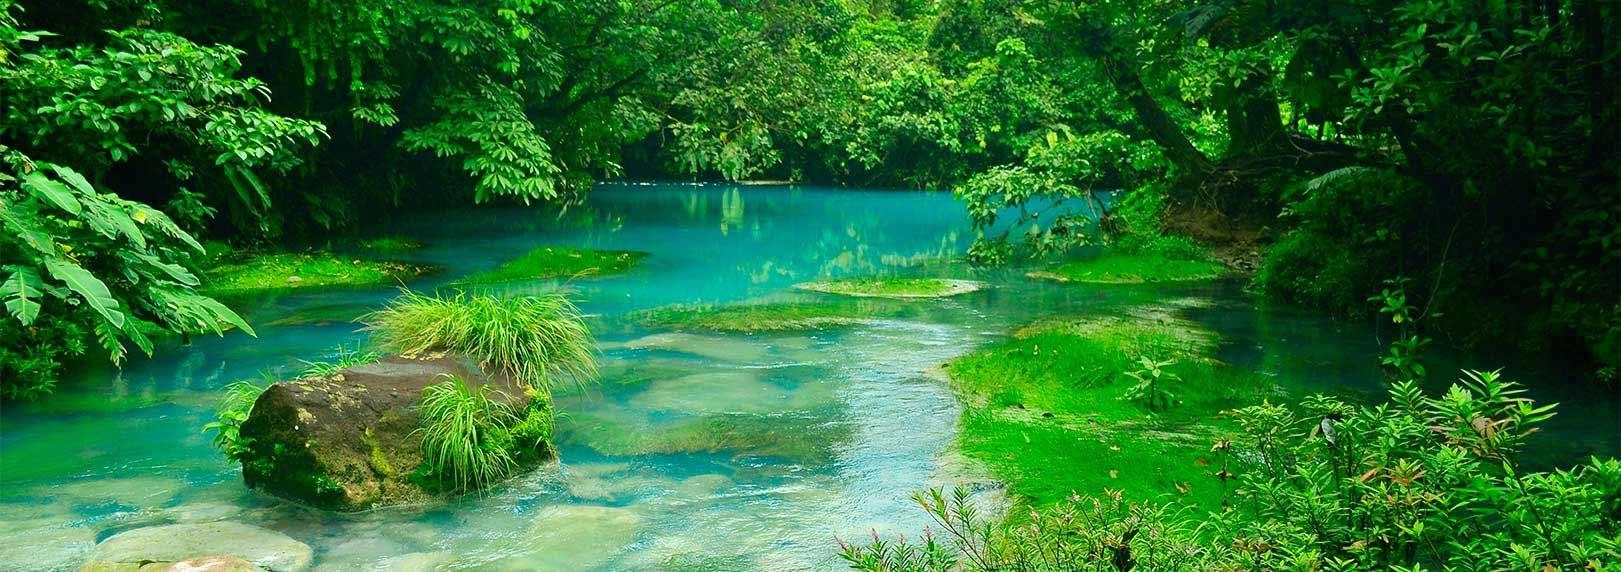 paix-rio-celeste-2-costa-rica-decouverte